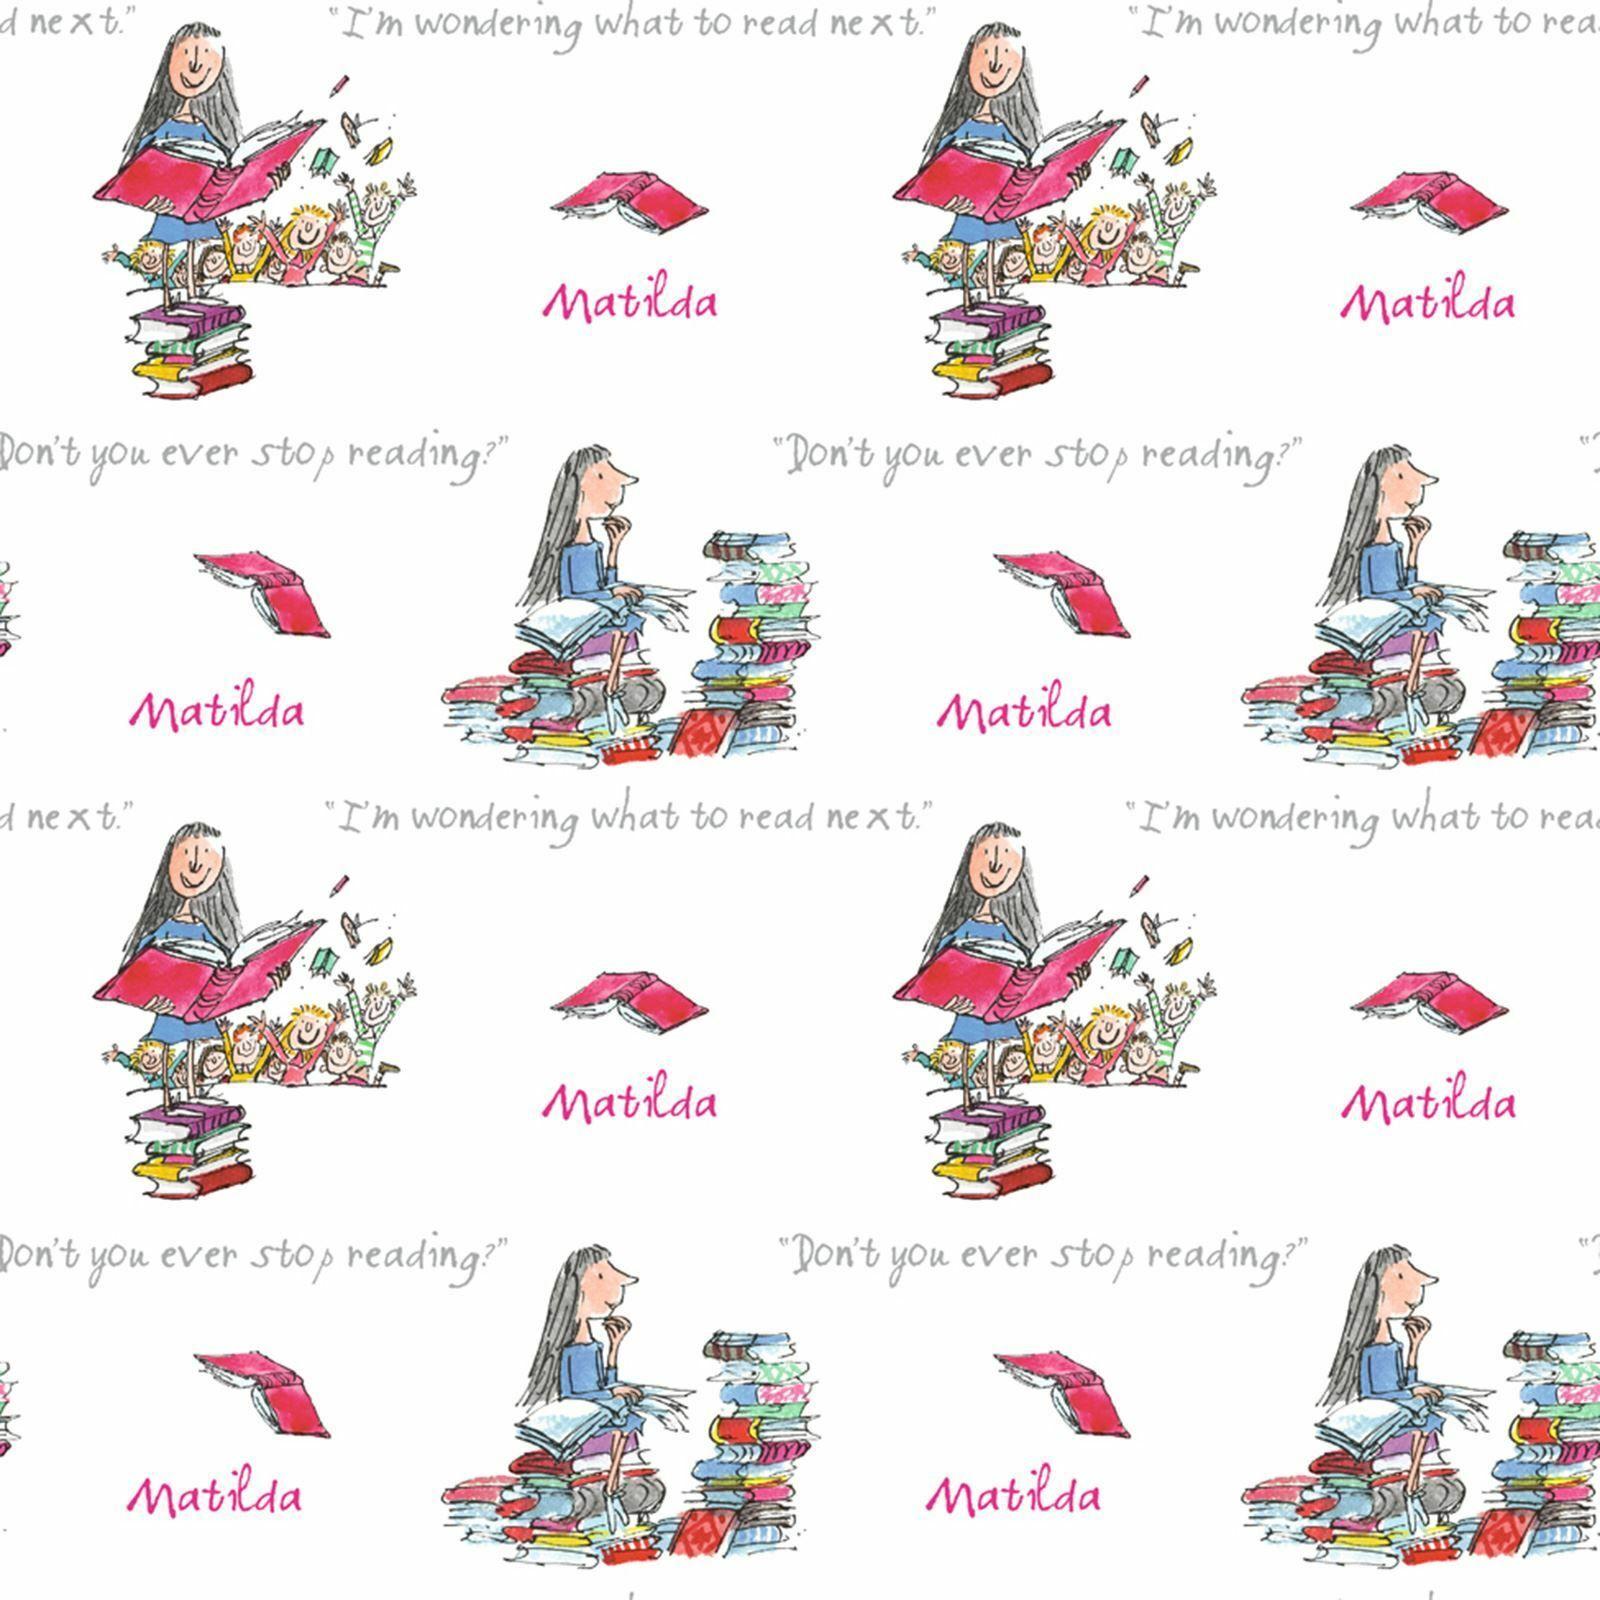 Roald Dahl Matilda Wallpaper Rolls